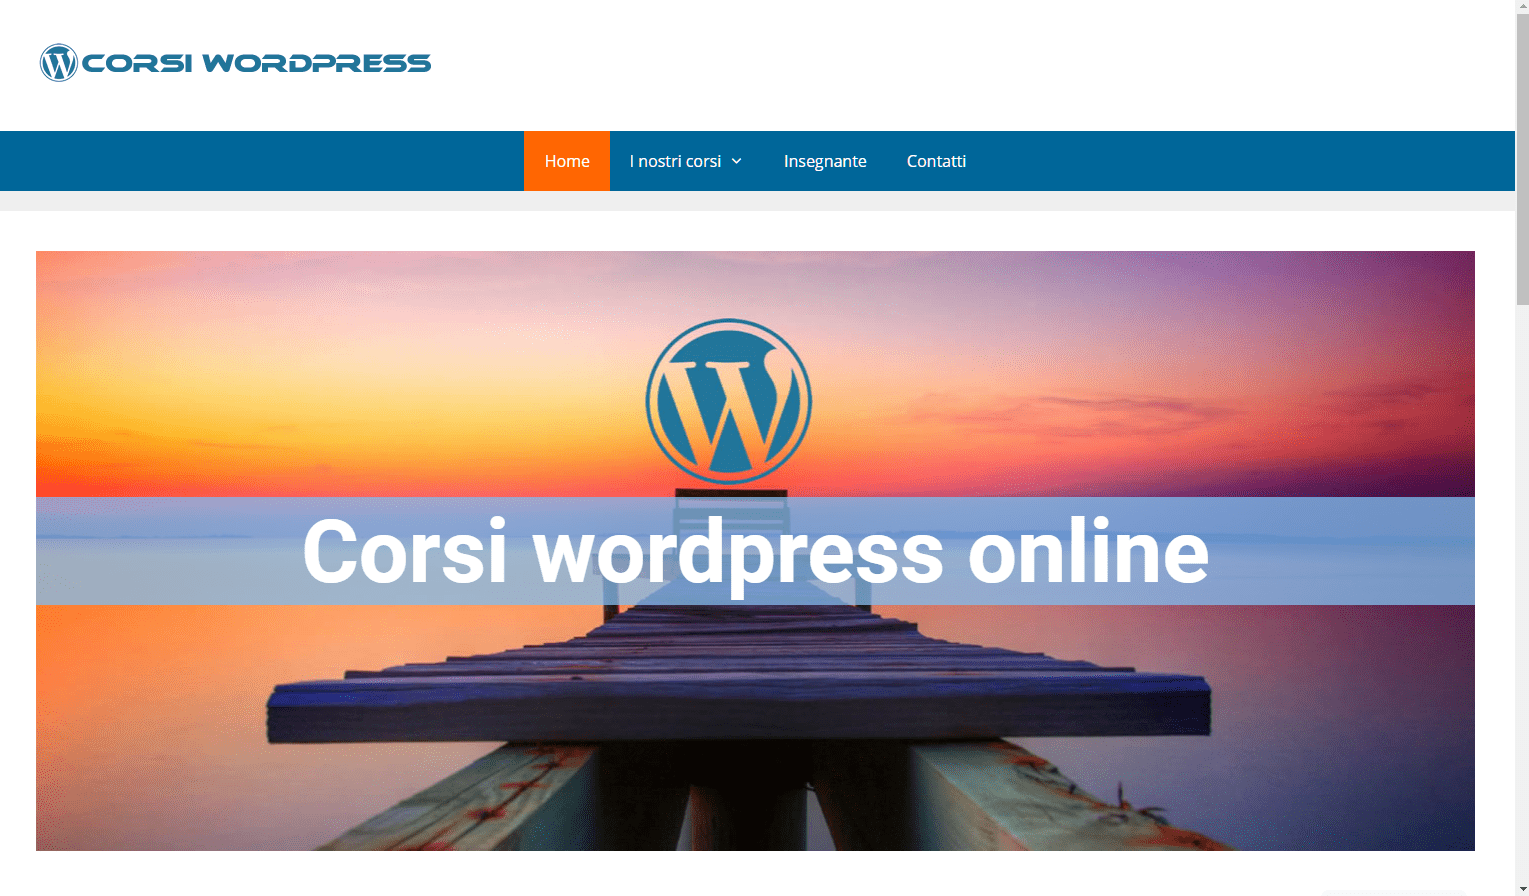 corsi wordpress online